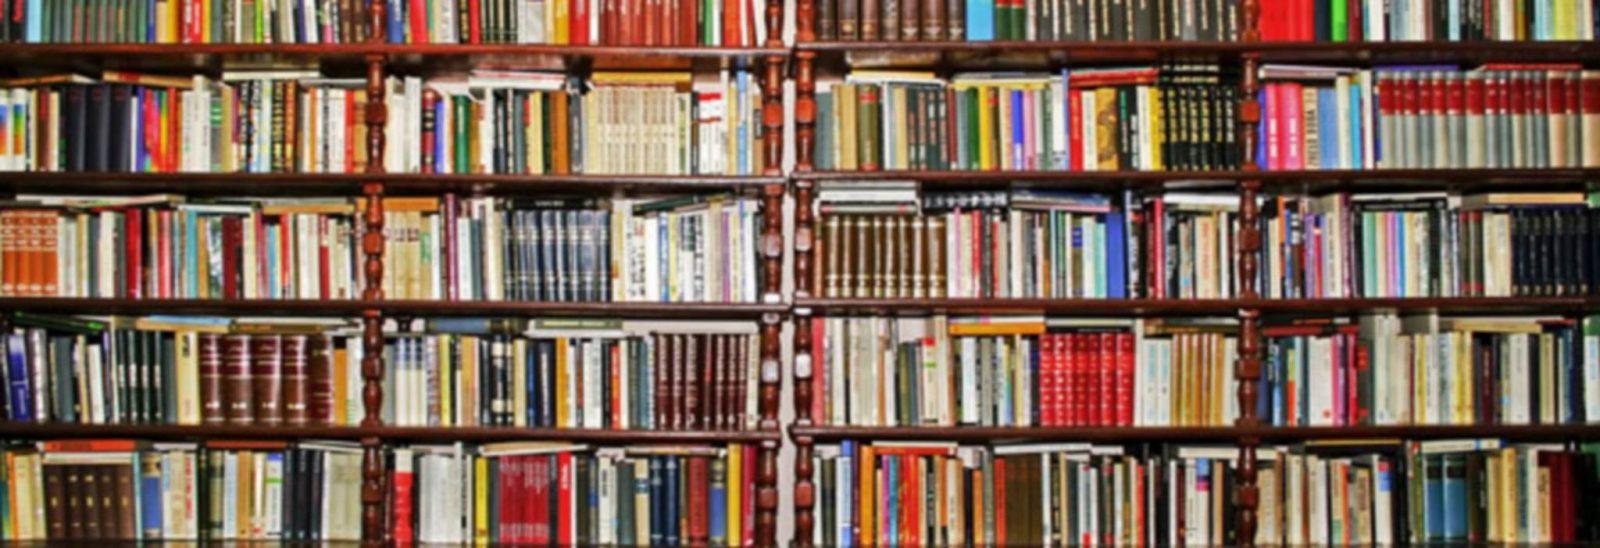 Bibliotheque – Billiers- Damgan la roche bernard tourisme